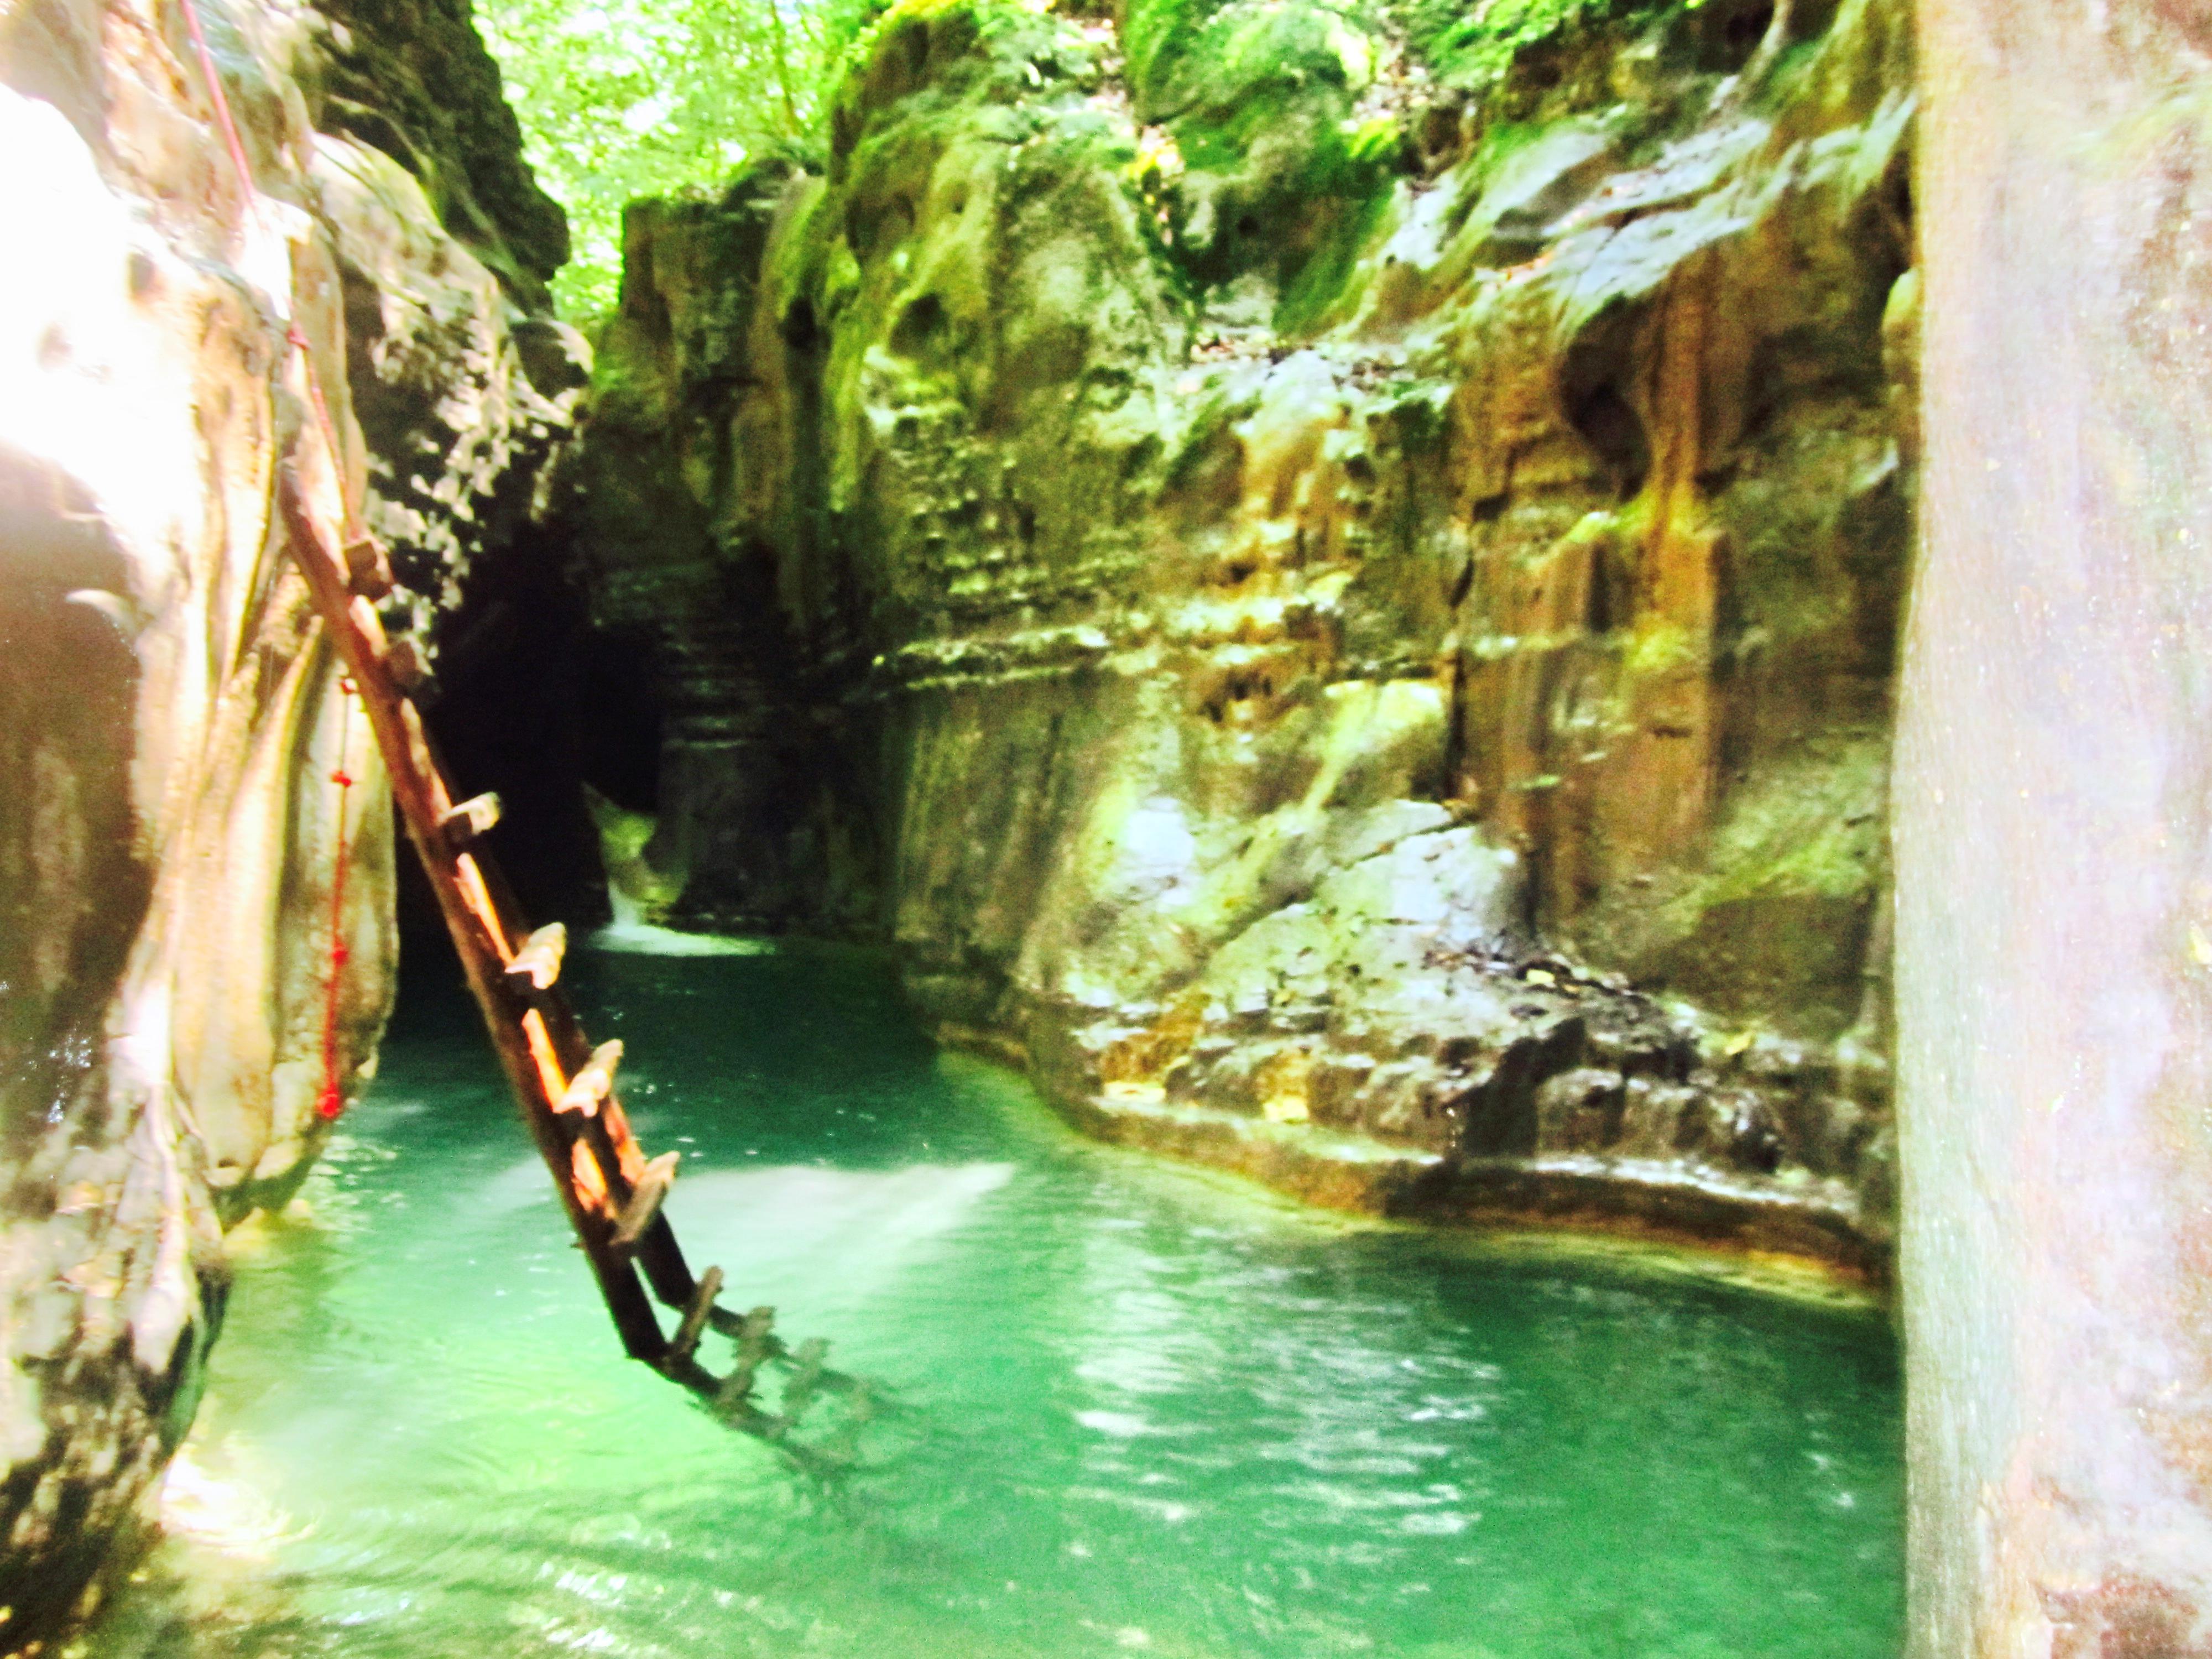 Damajaqua Cascades (27 Waterfalls)